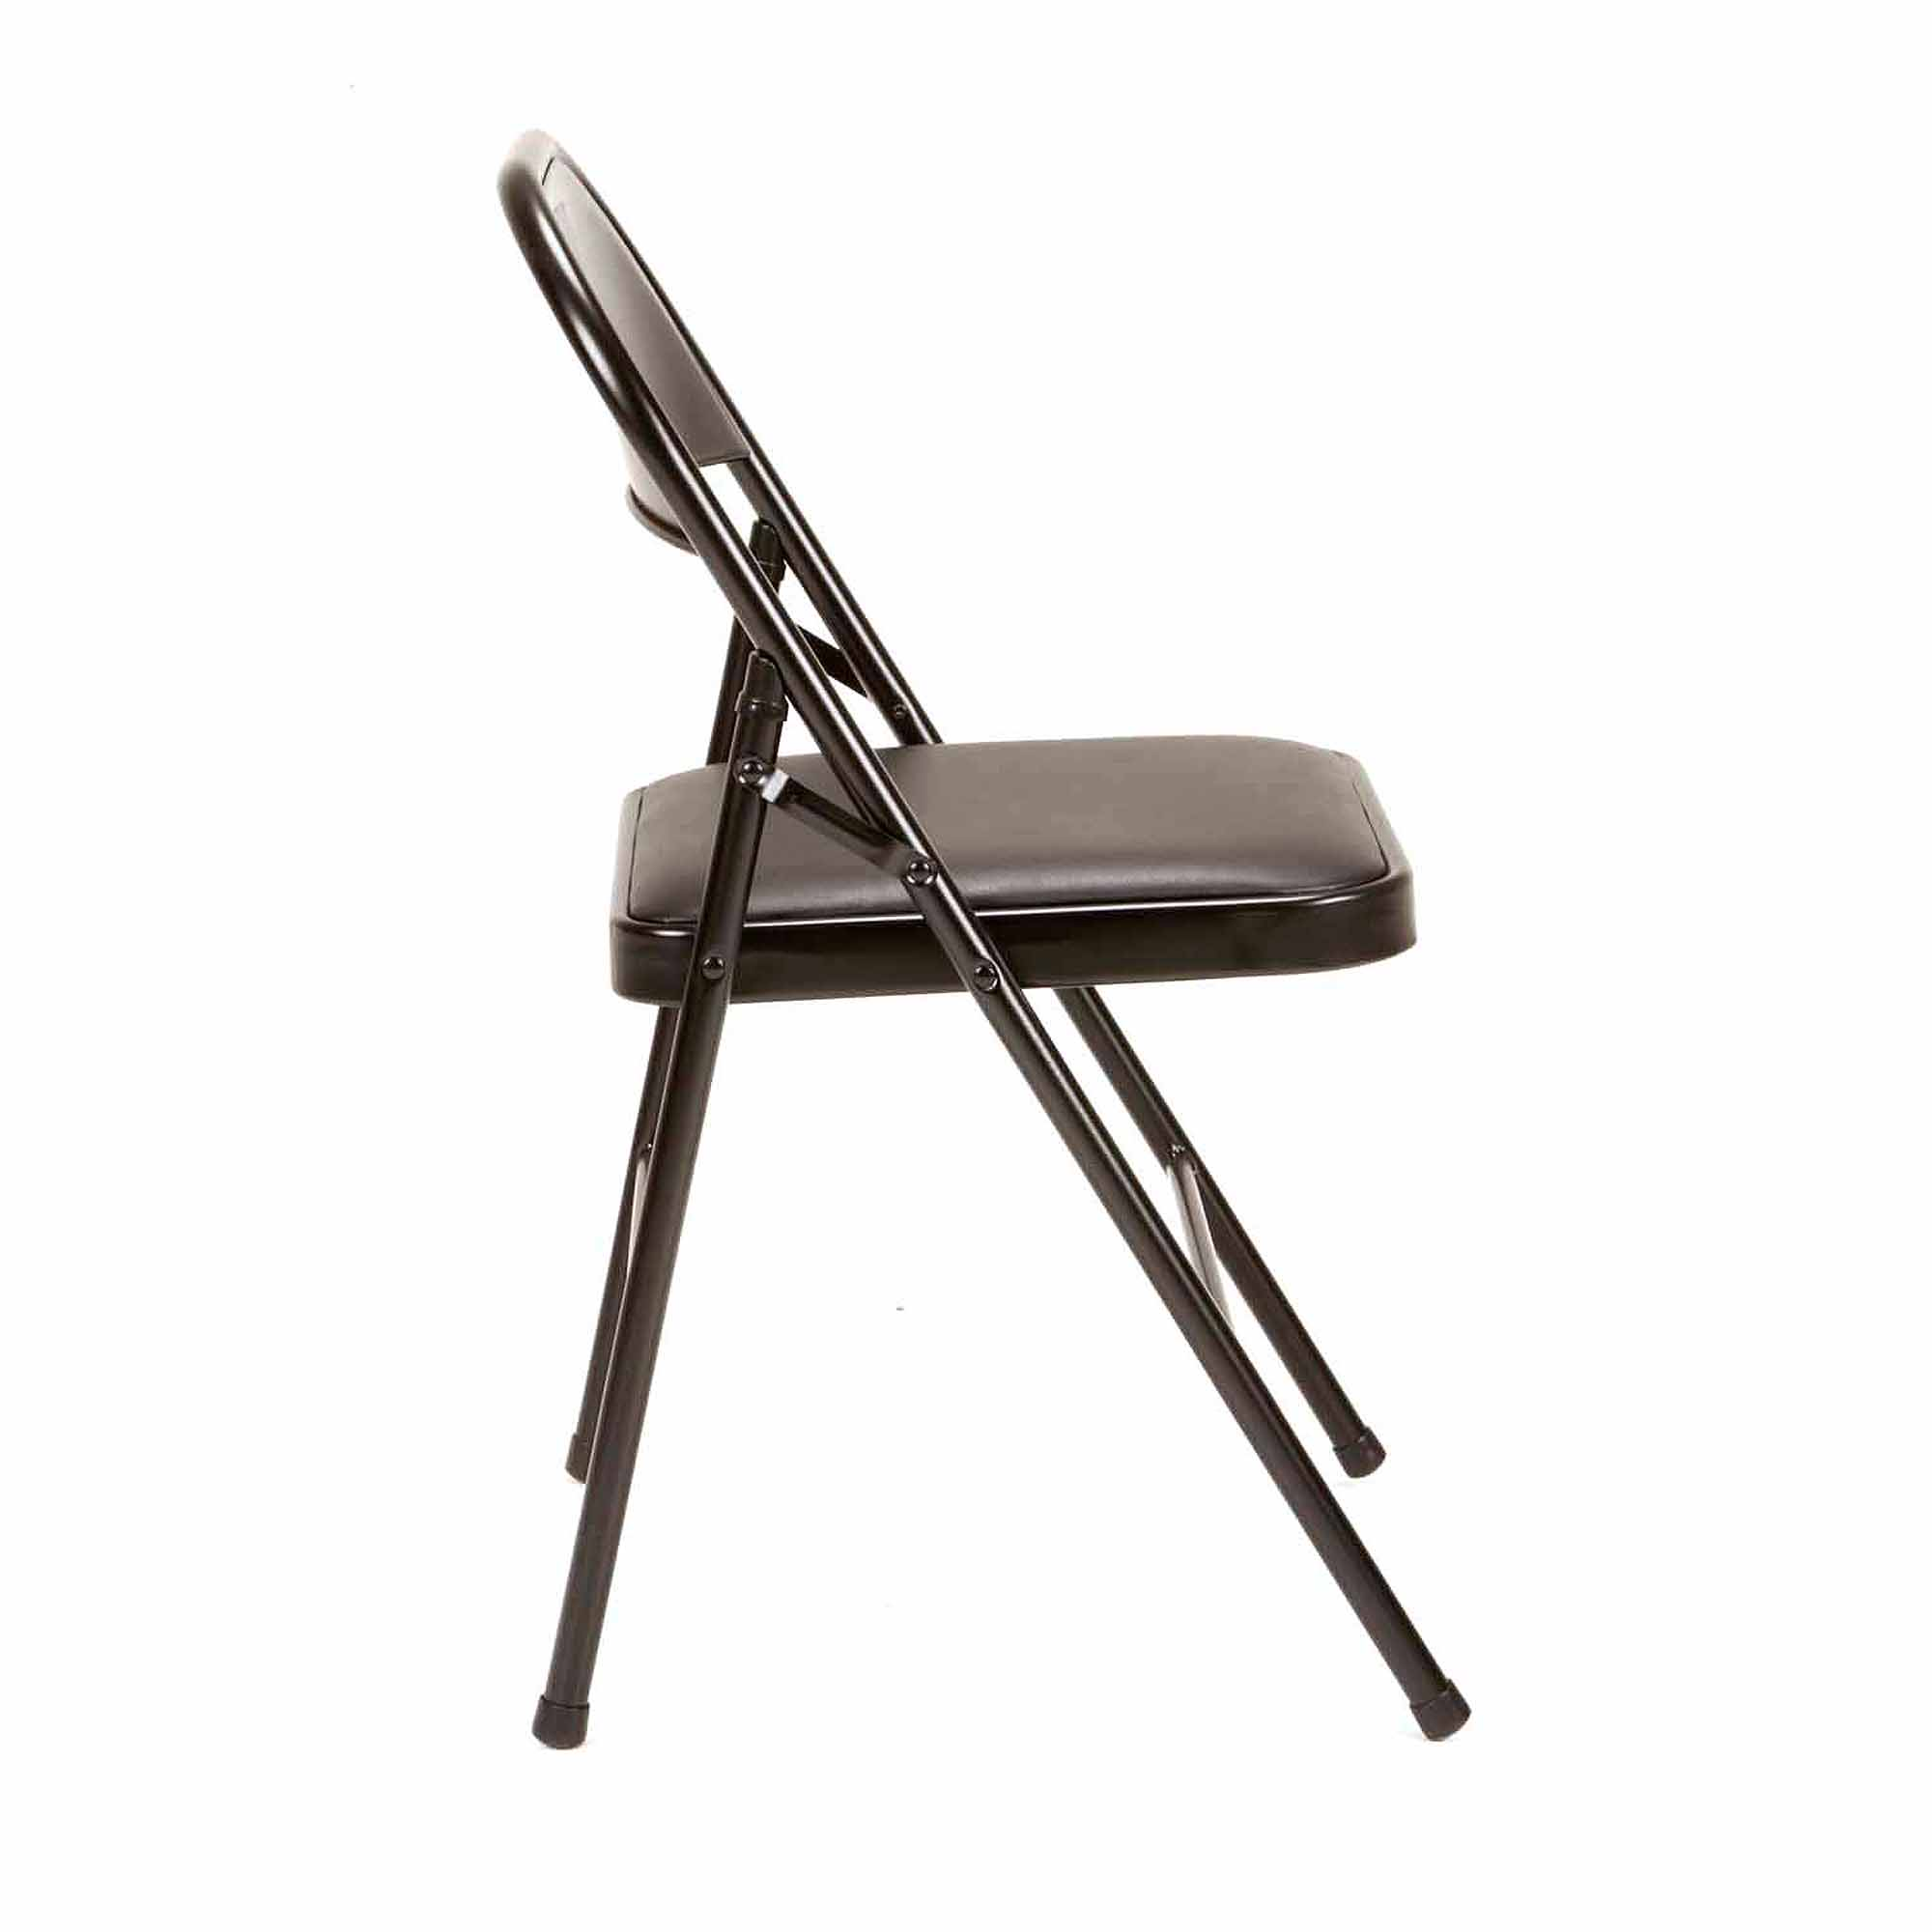 Mainstays Vinyl Chair, Set of 4, Black